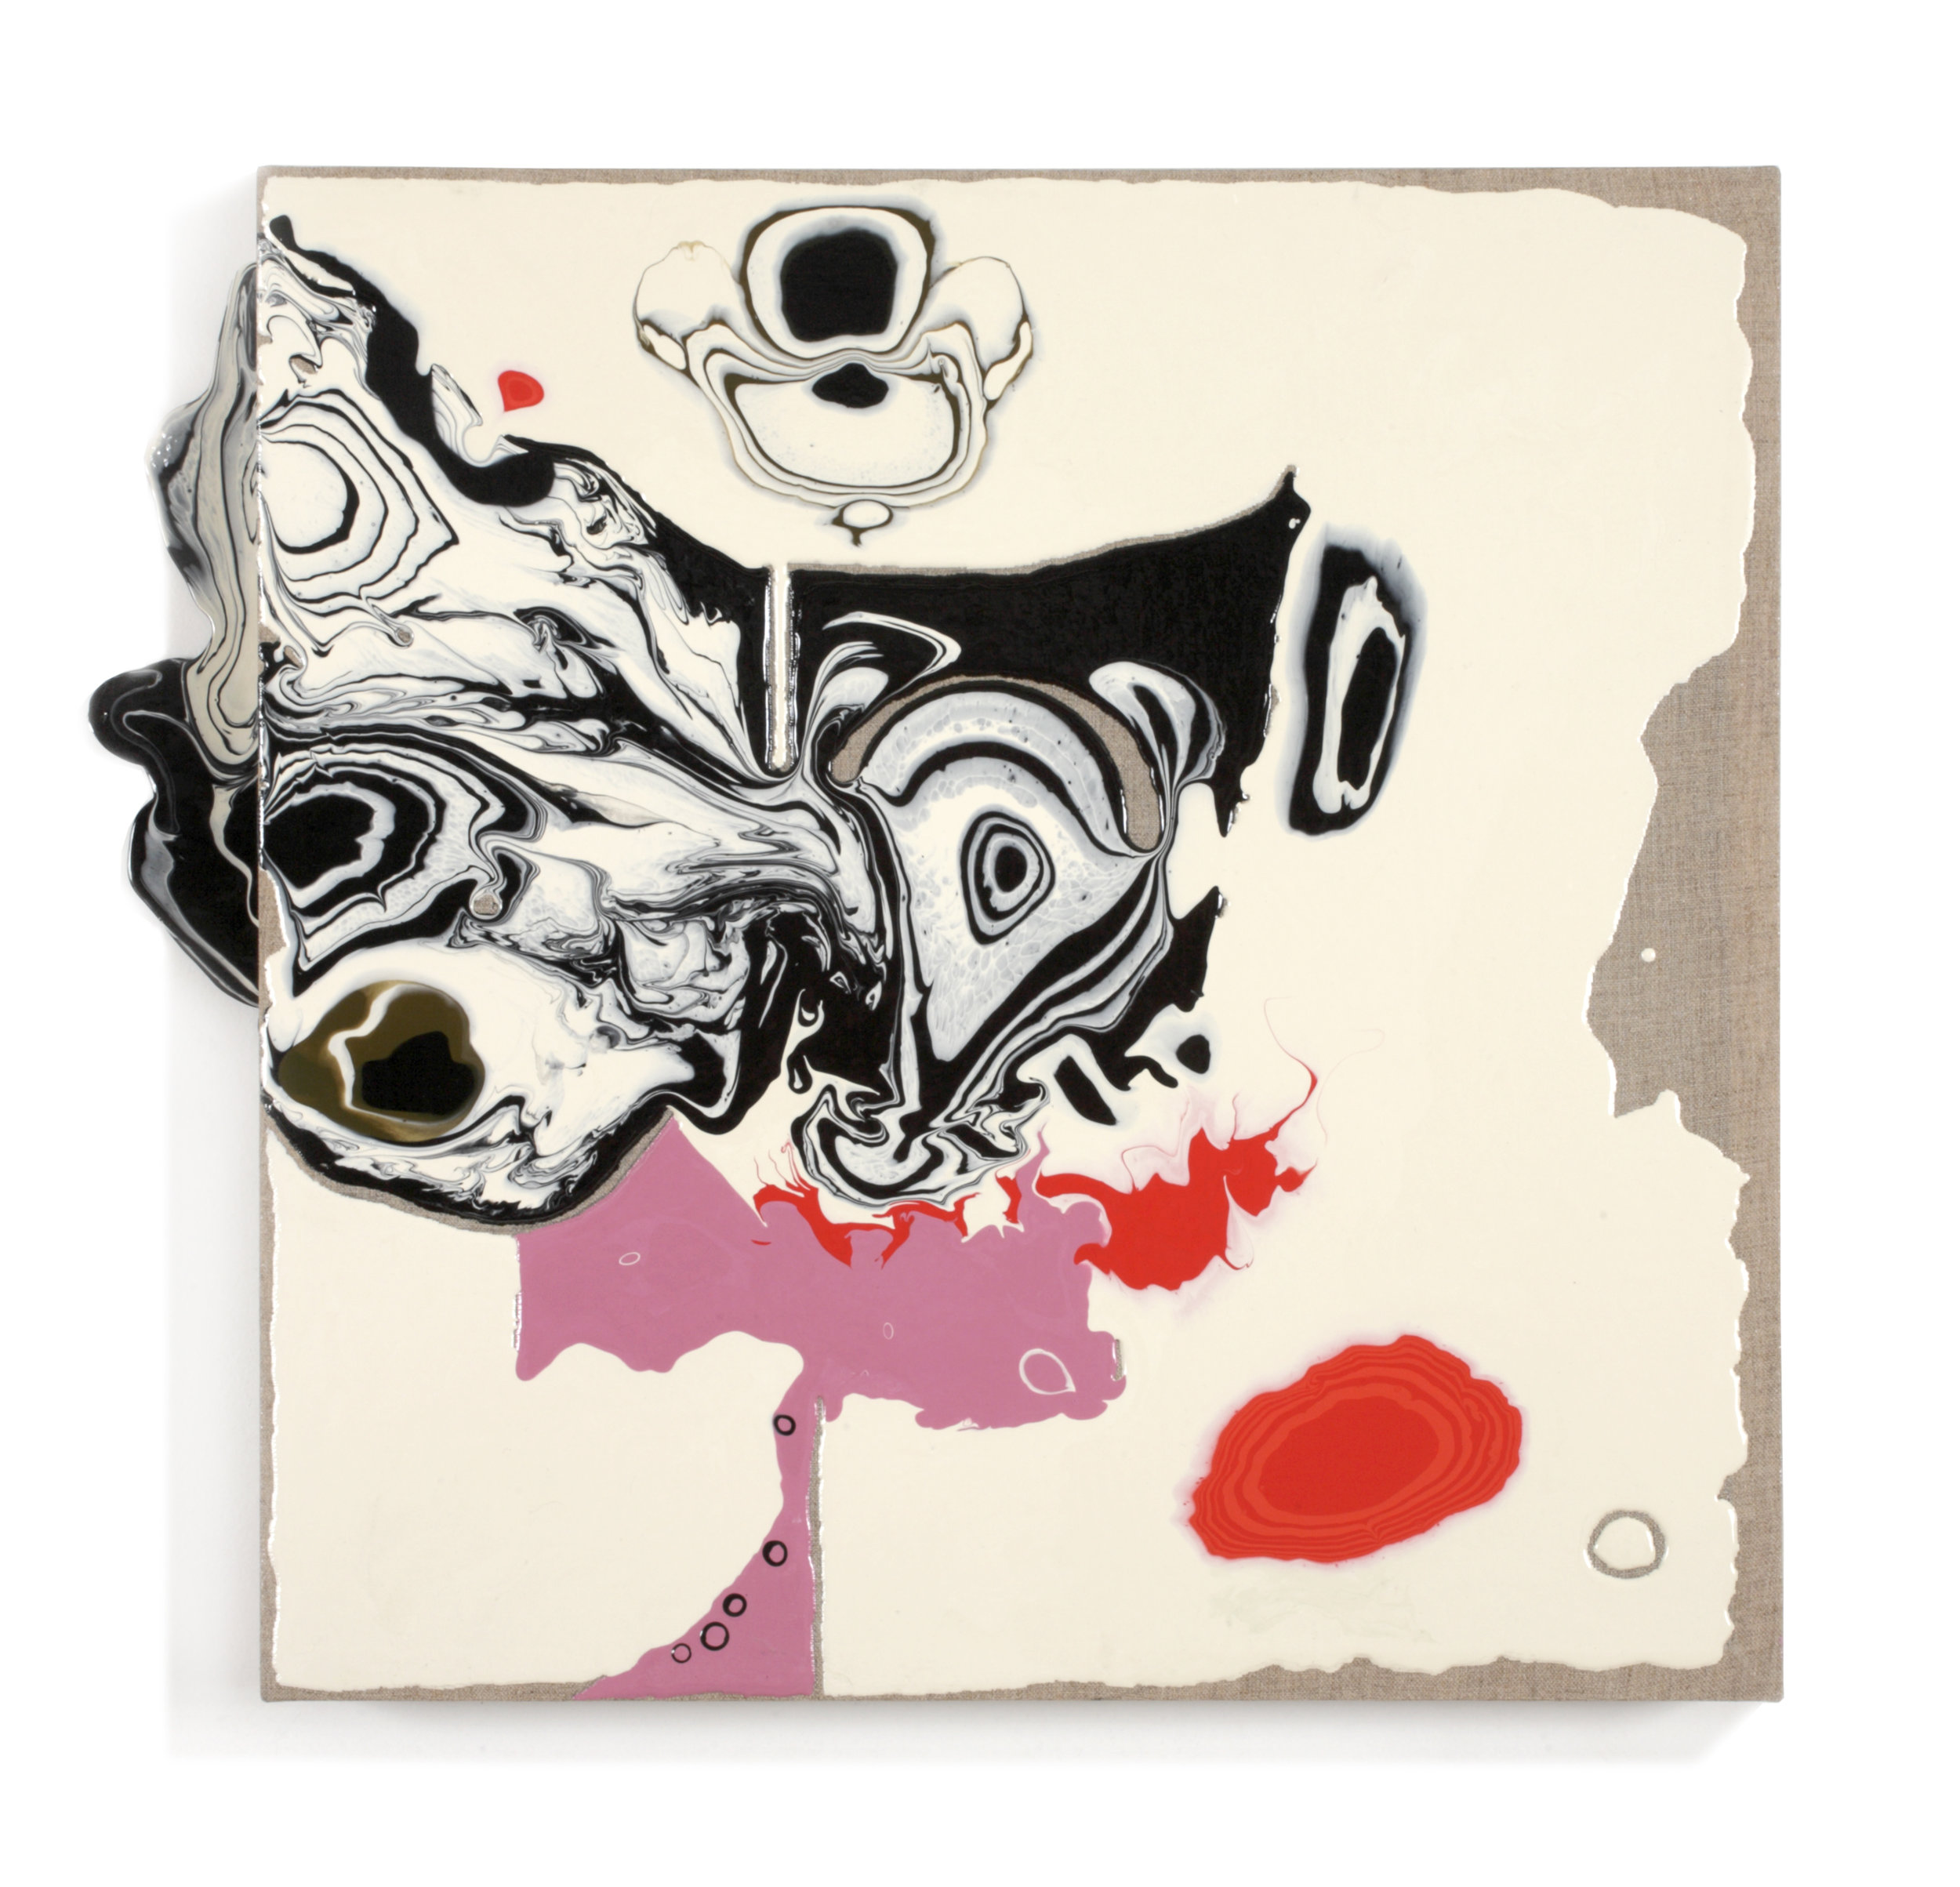 "Mid-Century Book Cover series, ""Farenheit 451"", acrylic medium on linen, 23 x 26 x 3"", $1,500"